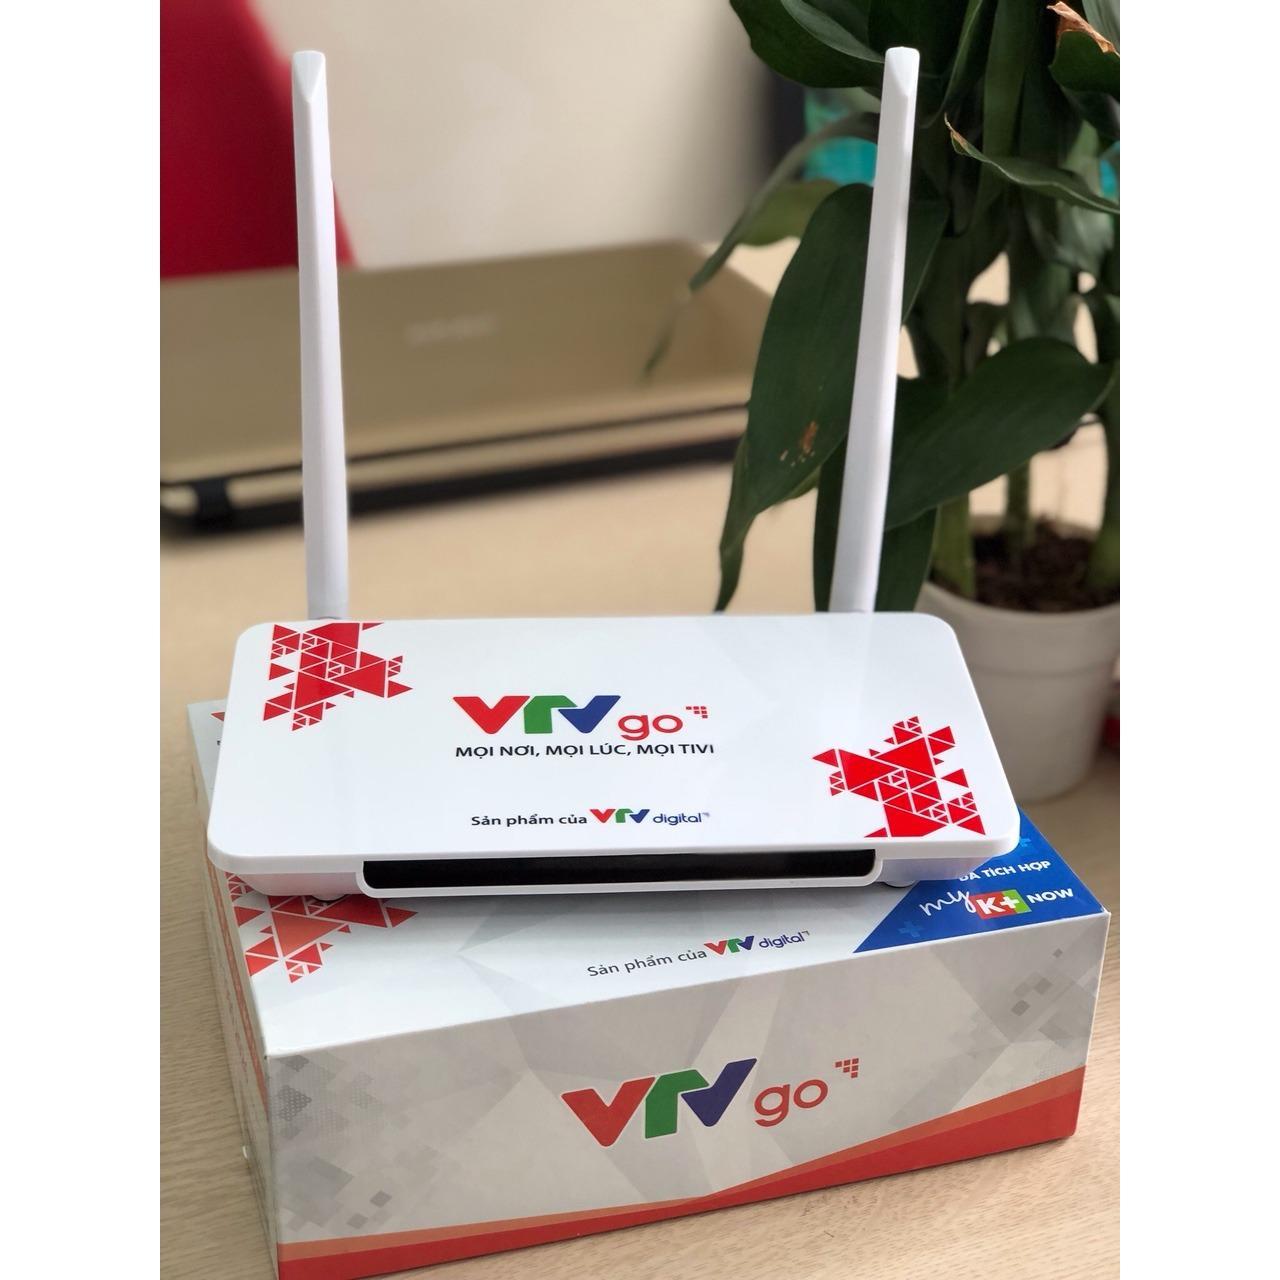 Hình ảnh VTV Go - VTV Digital - Android 6.0 - Tích hợp MyK+